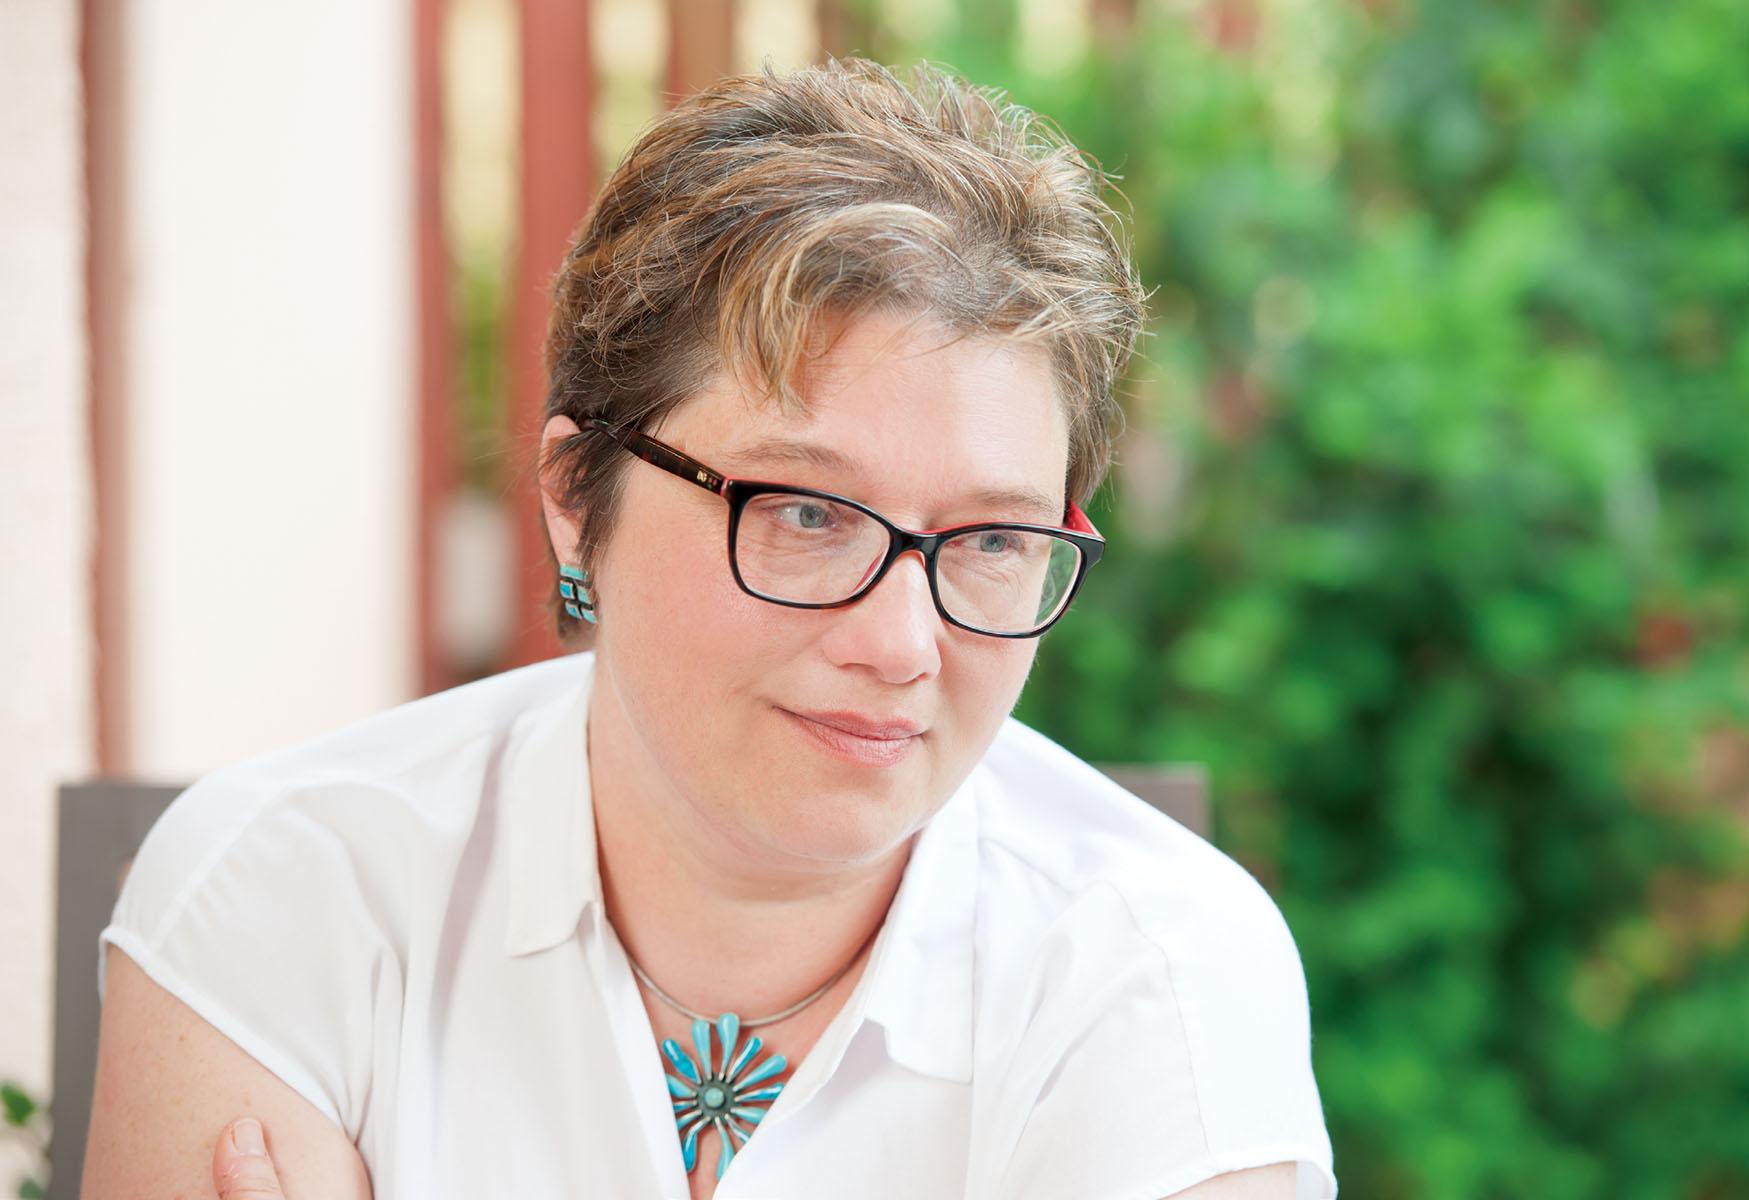 Maria Bucur, interviu pentru Marea Dragoste-revistatango.ro, nr. 140, iunie 2018